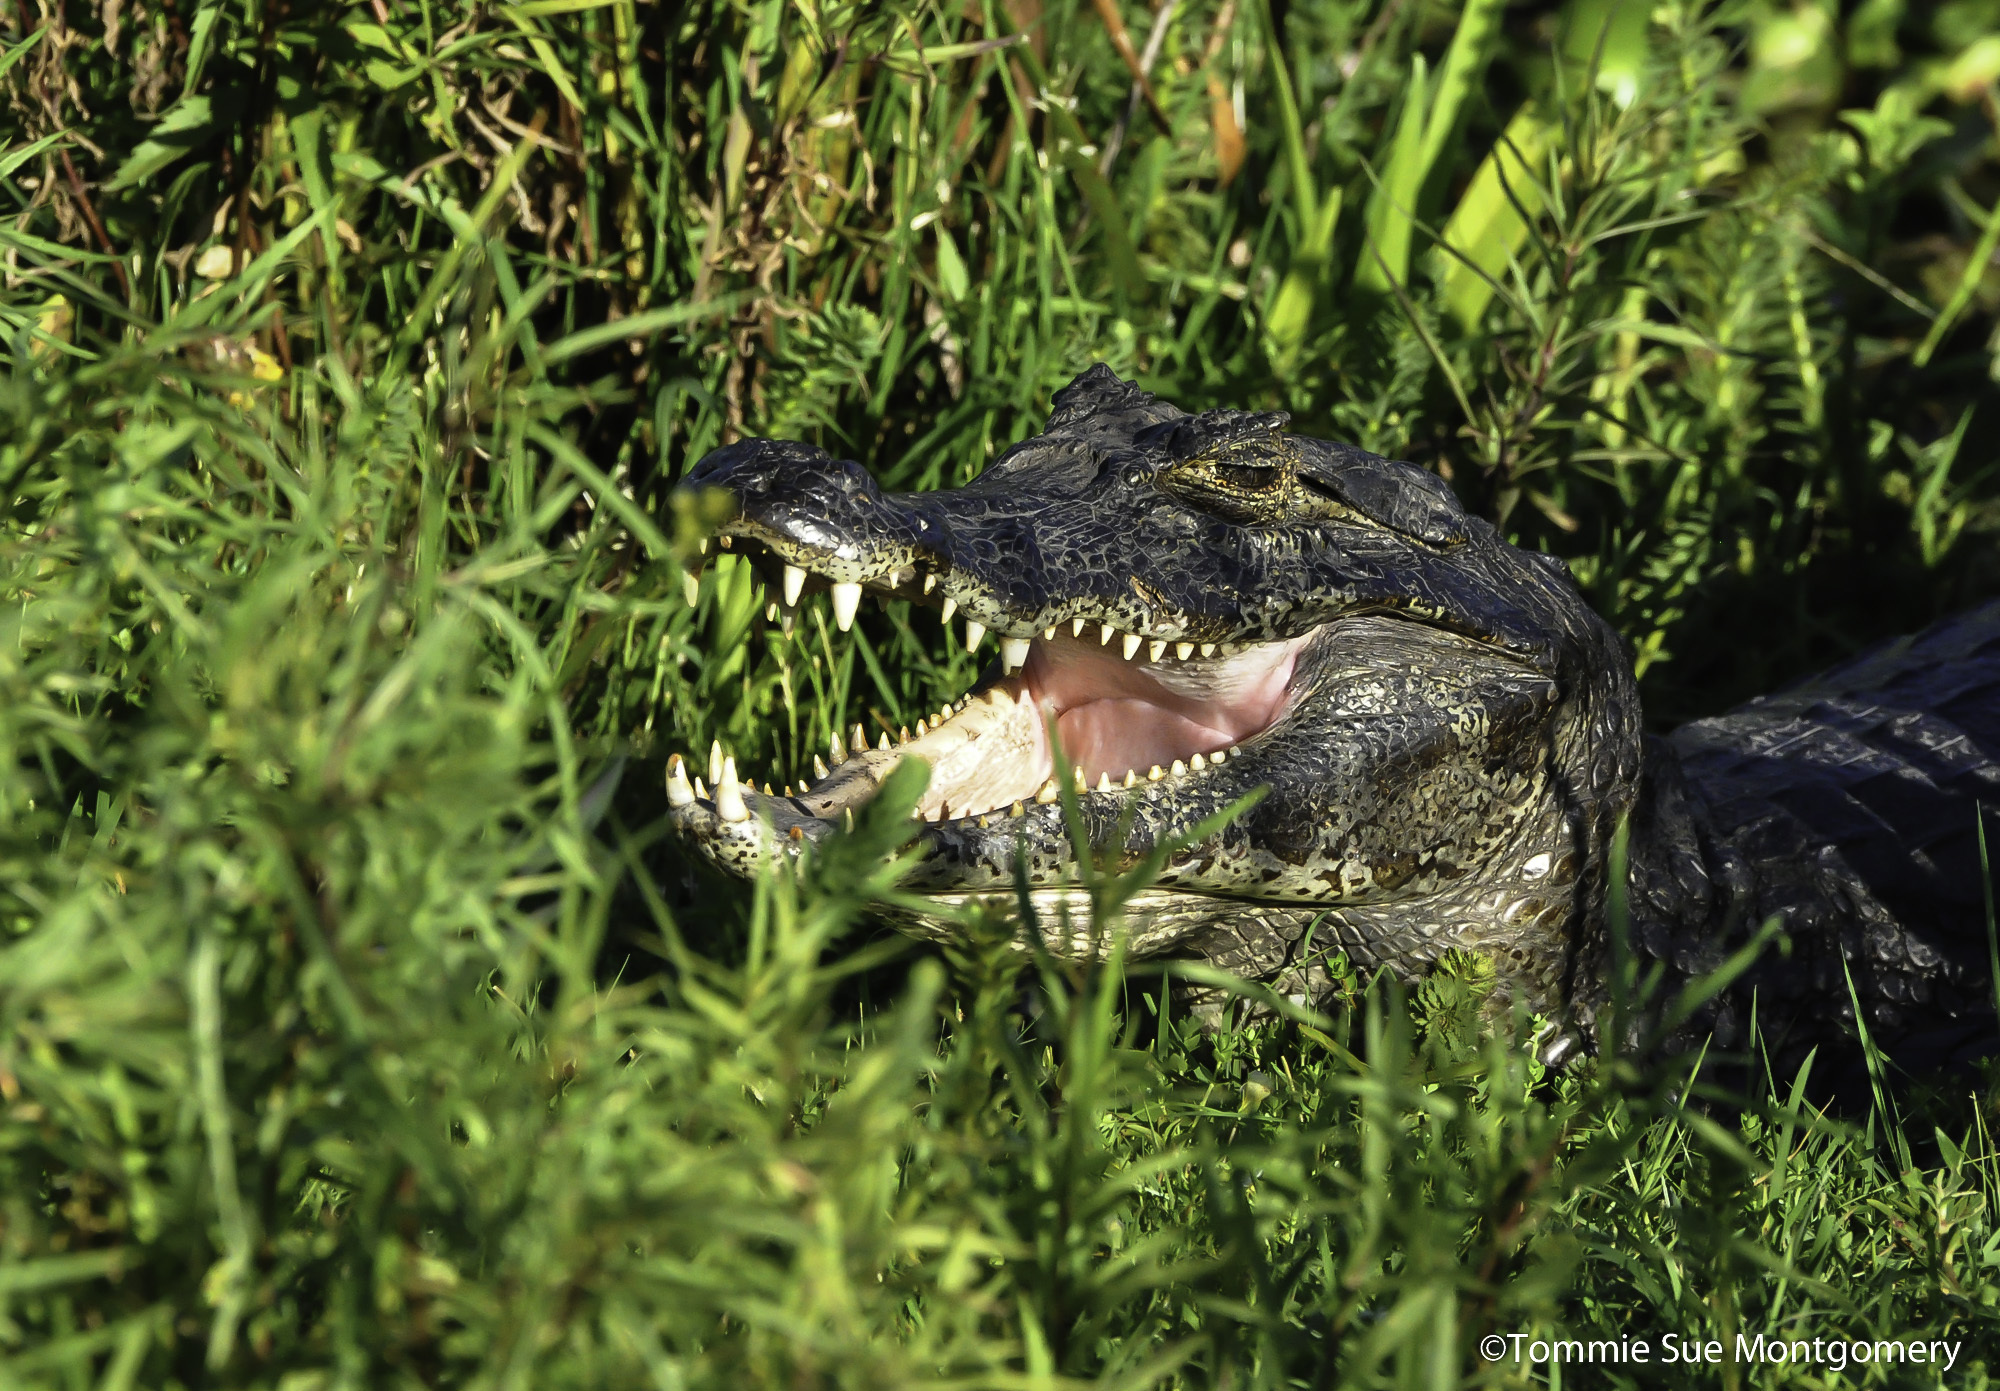 south american alligator